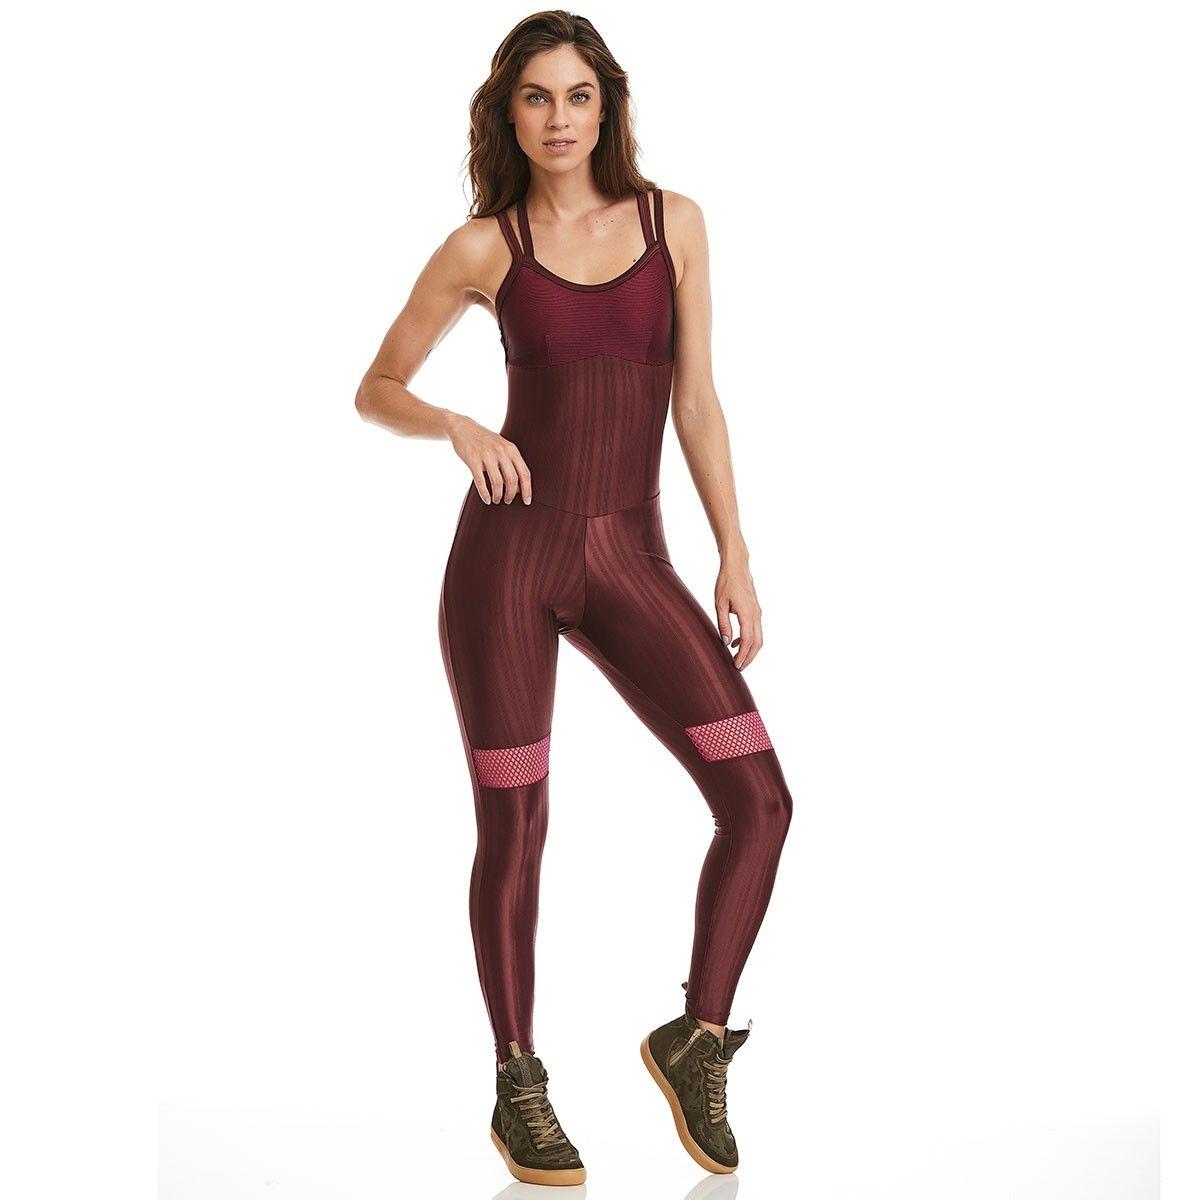 be4973a4b CAJUBRASIL Moda Fitness